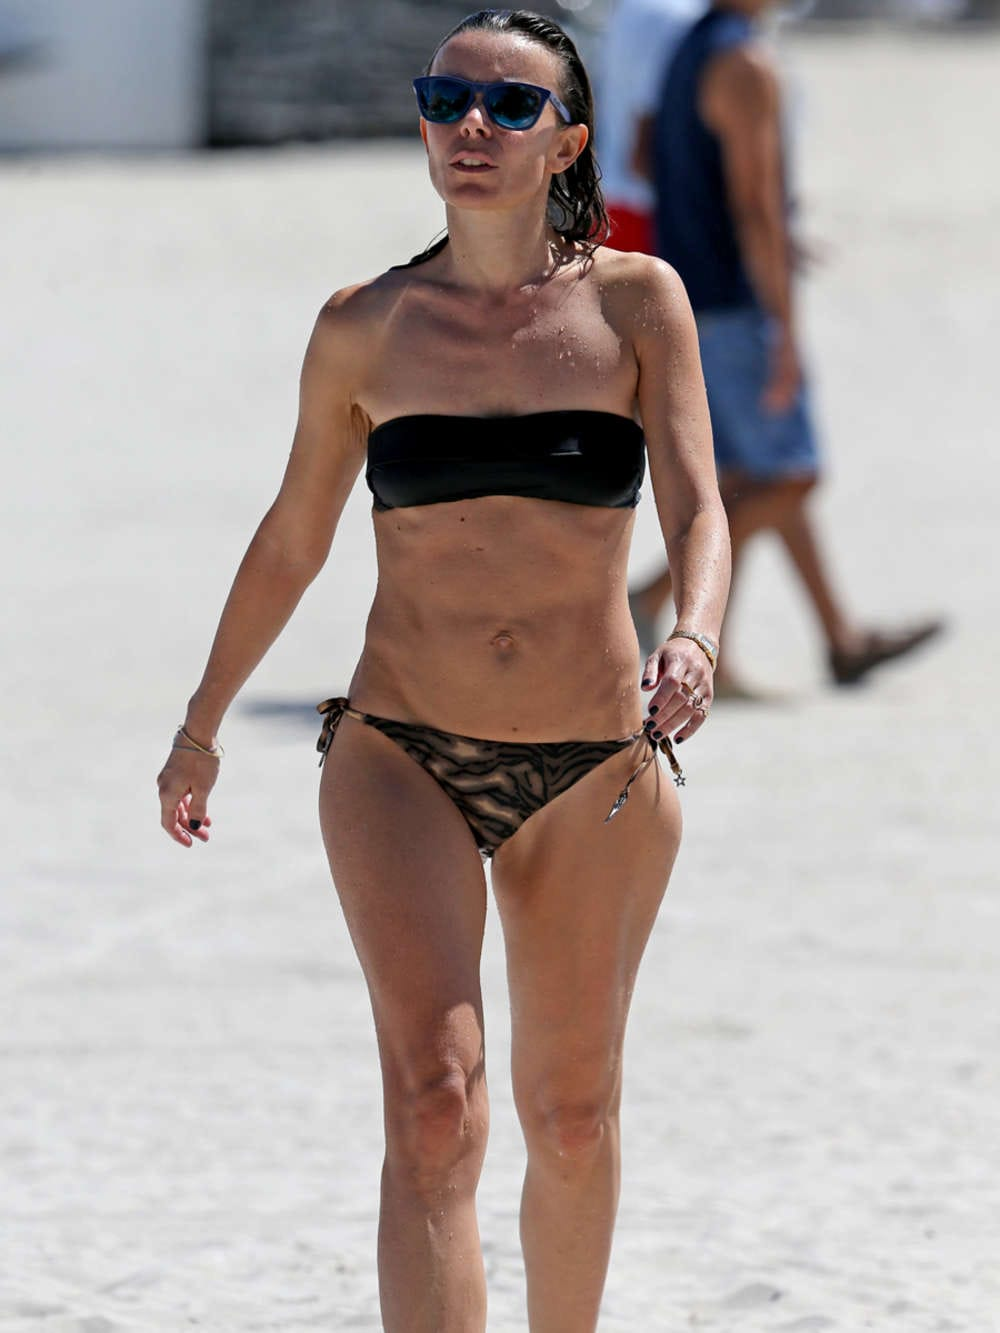 Bikini Elodie Bouchez nudes (24 images), Boobs